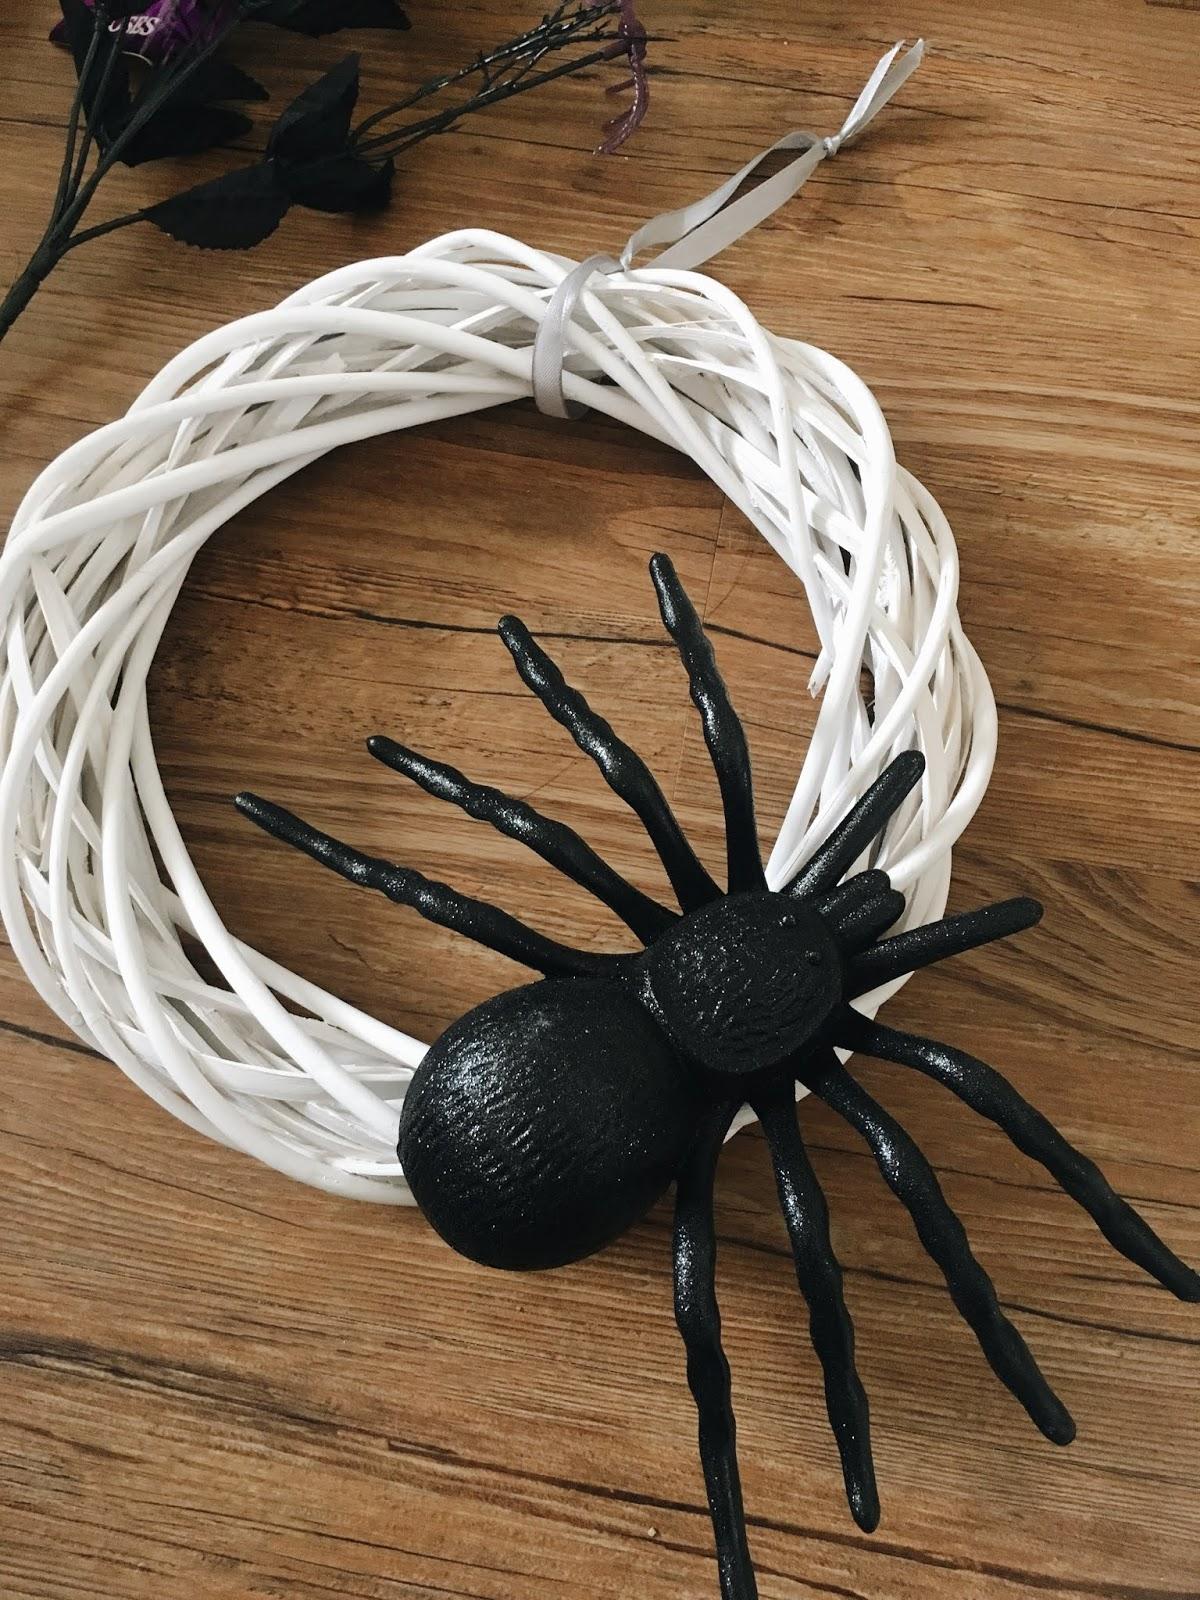 diy halloween spider wreath - under $10 | kelsey diane